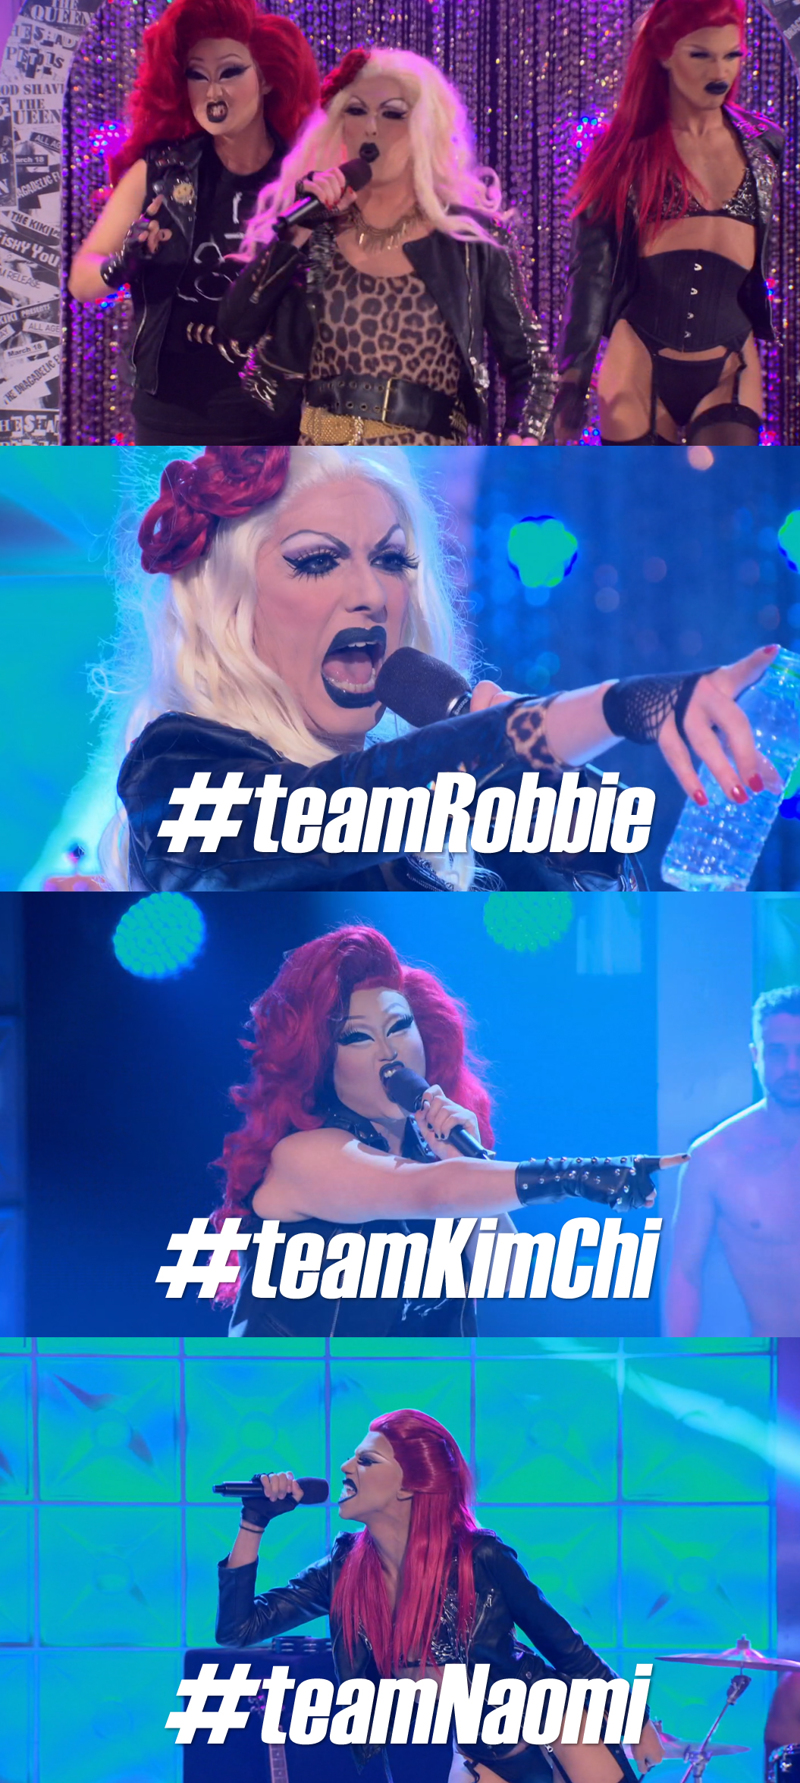 SLAY BITCHES!! ♥ #teamRobbie #teamKimChi #teamNaomi